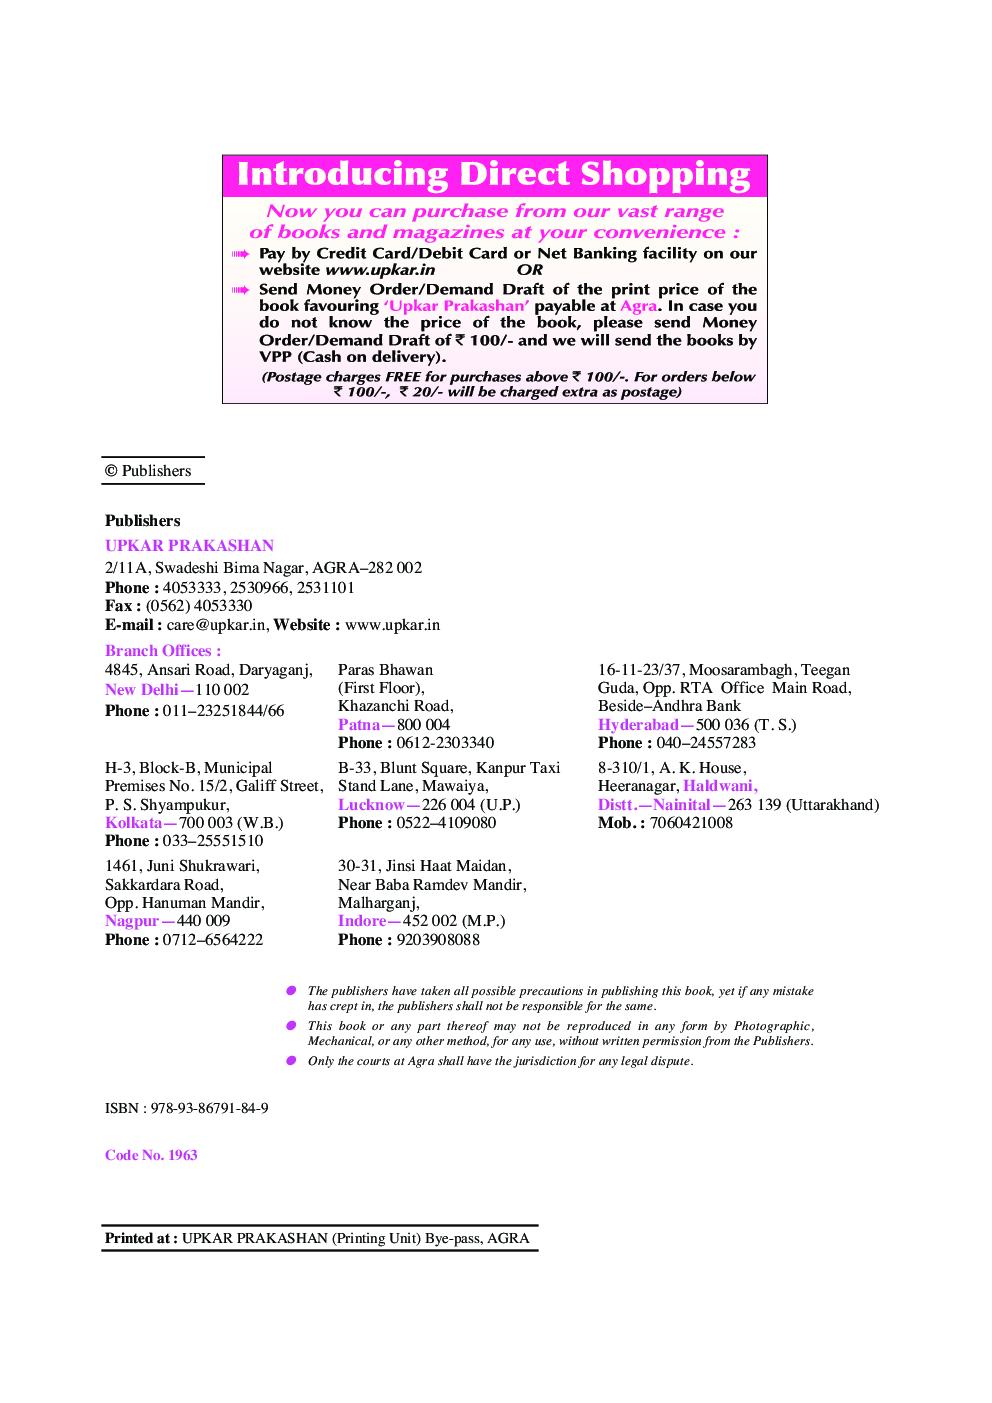 Uttar Pradesh Sainik School Entrance Exam For Class - IX - Page 3